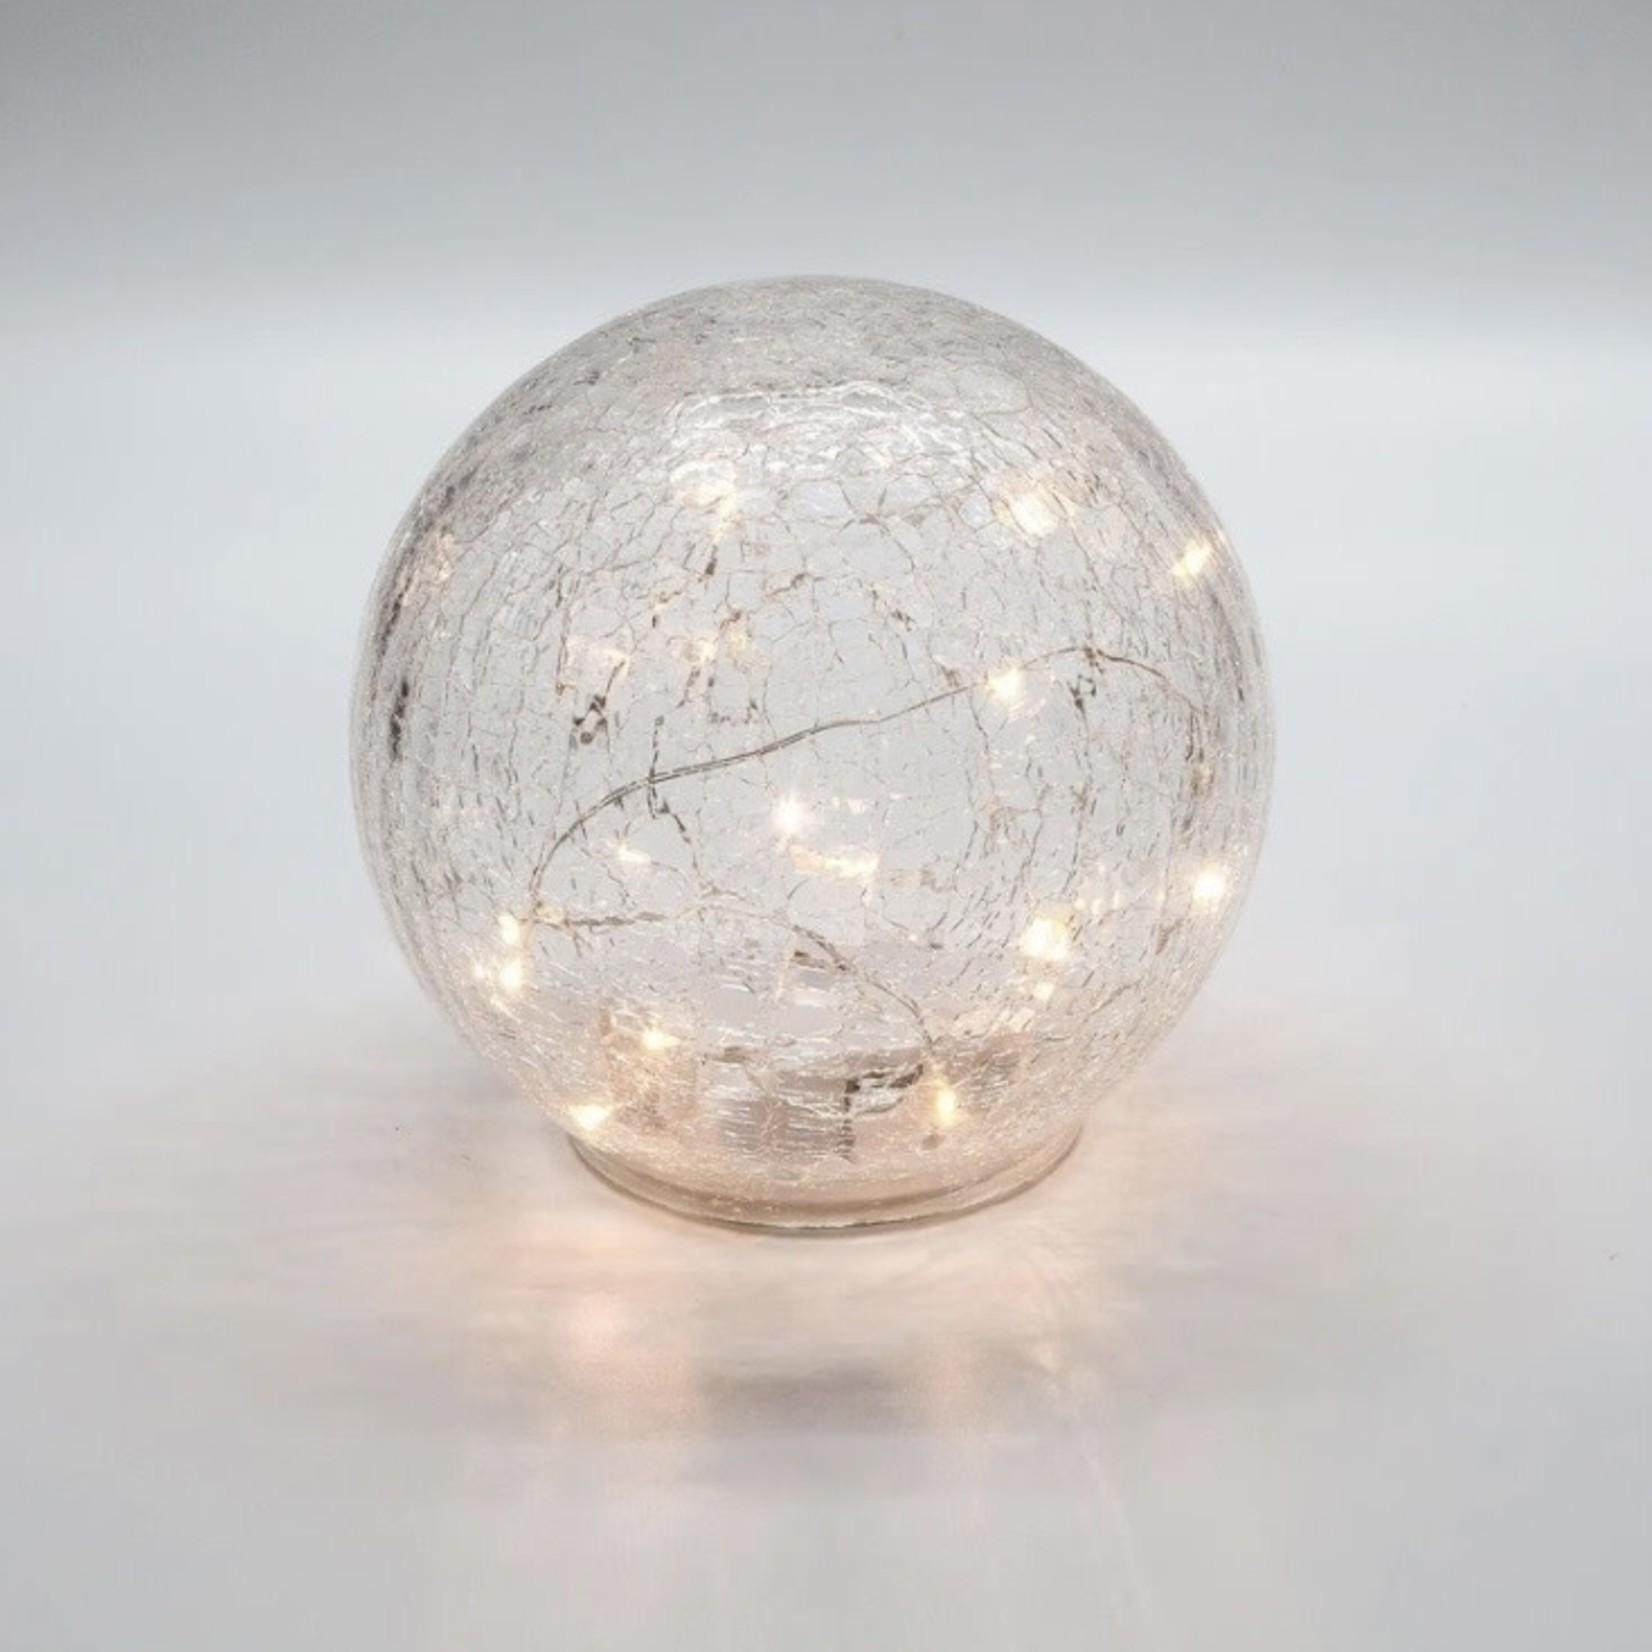 Torre & Tagus LED Sphere 6in Crackle Light